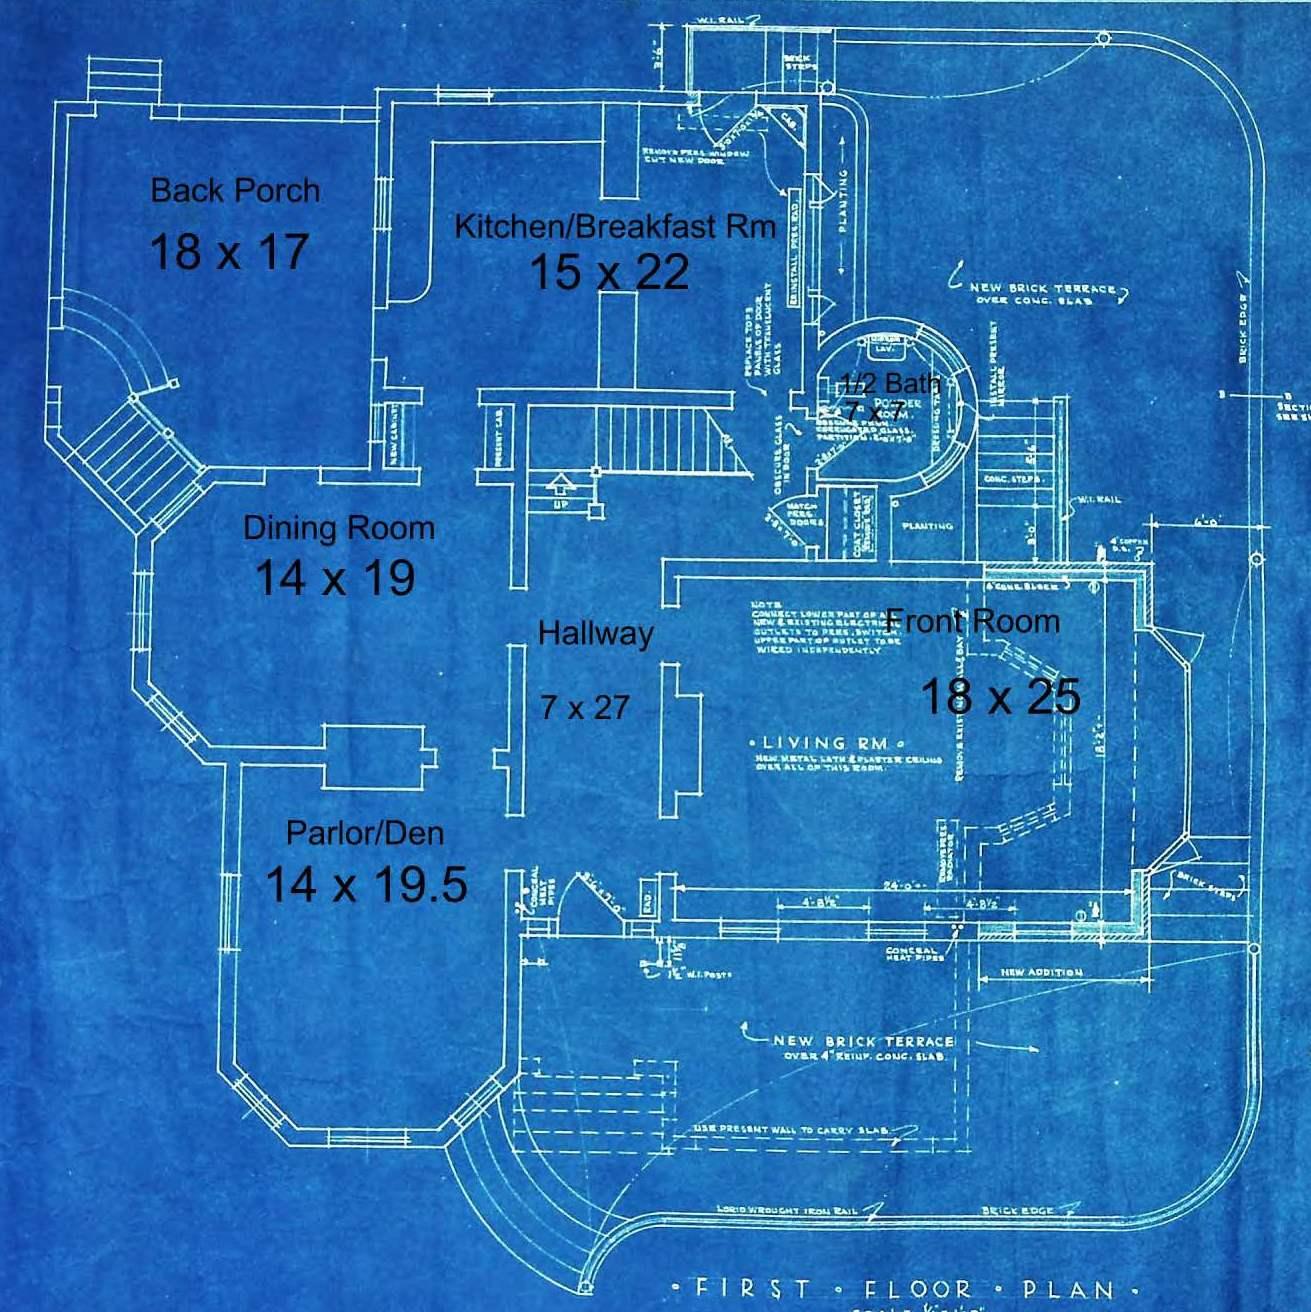 Blueprint of First Floor